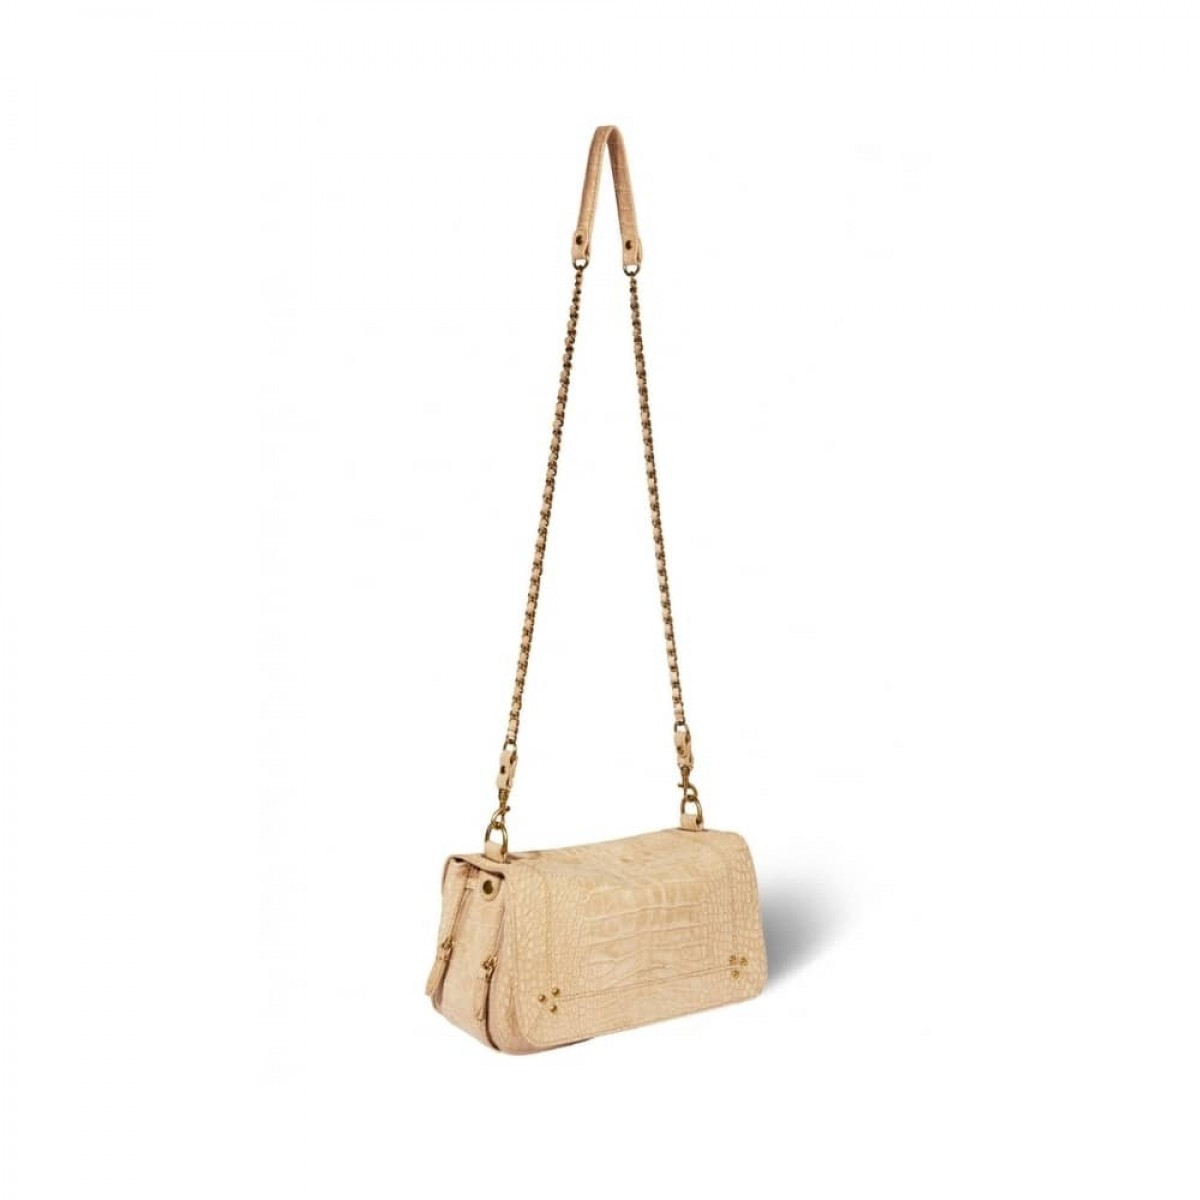 bobi taske - croco ficelle - med kæde